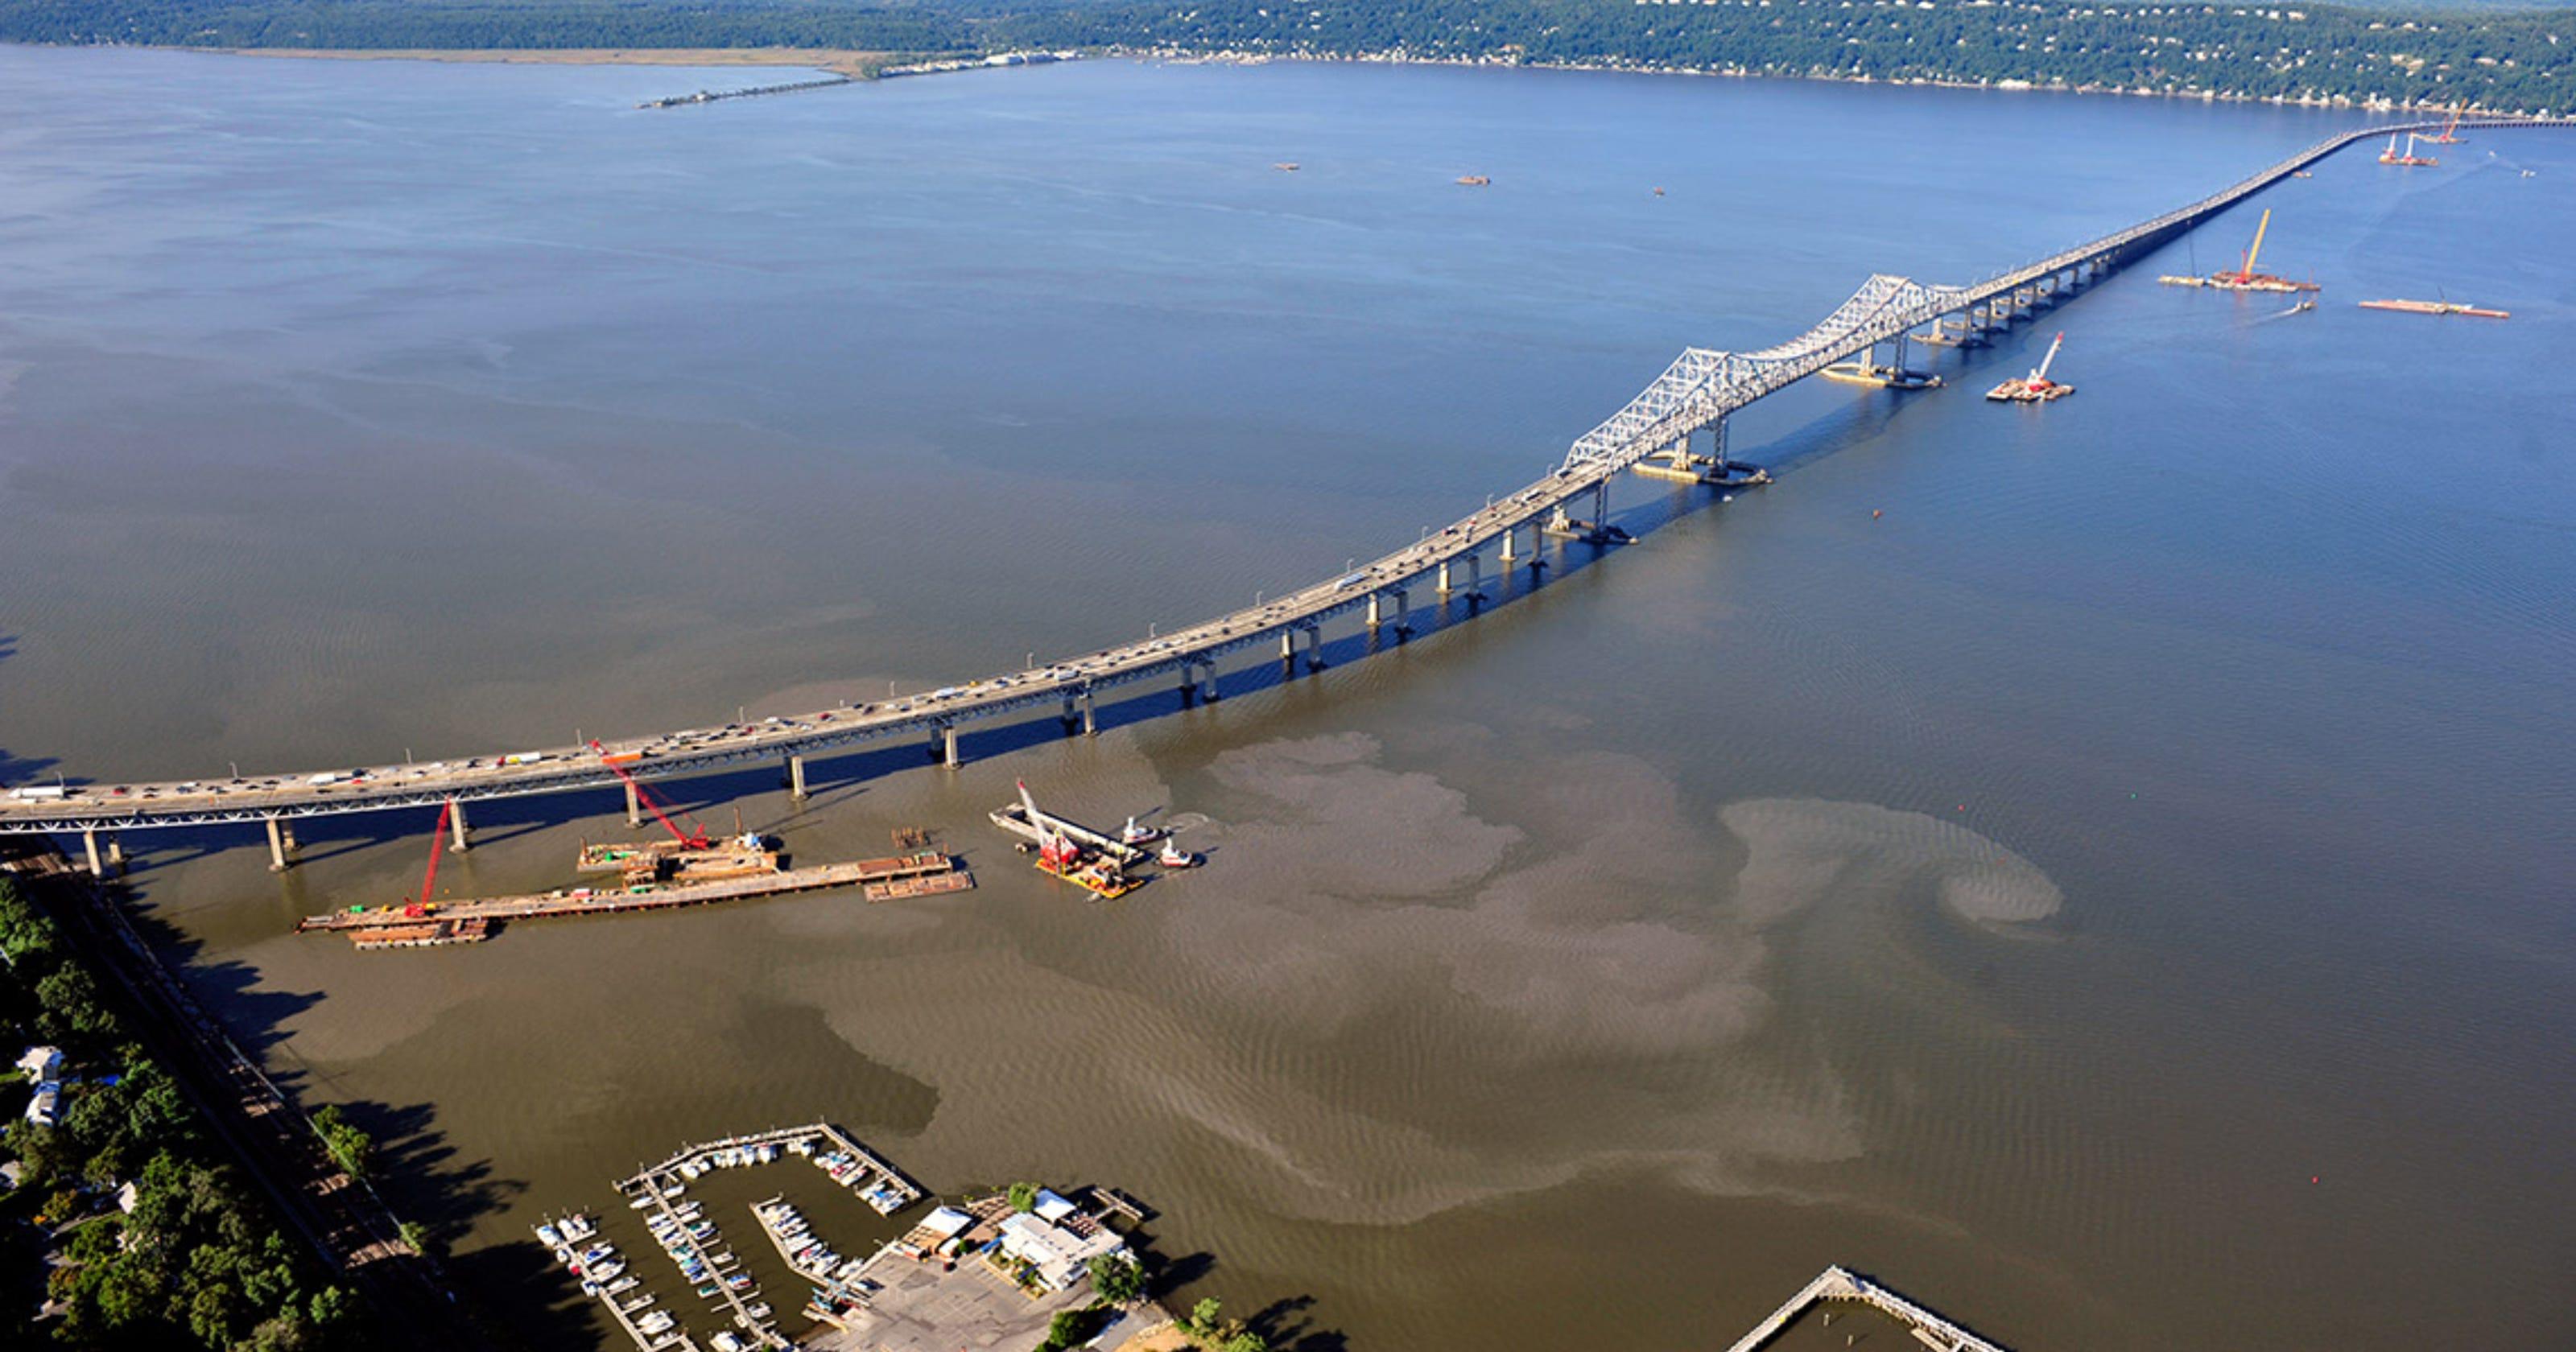 Riverkeeper Sweep returns to NY's shoreline